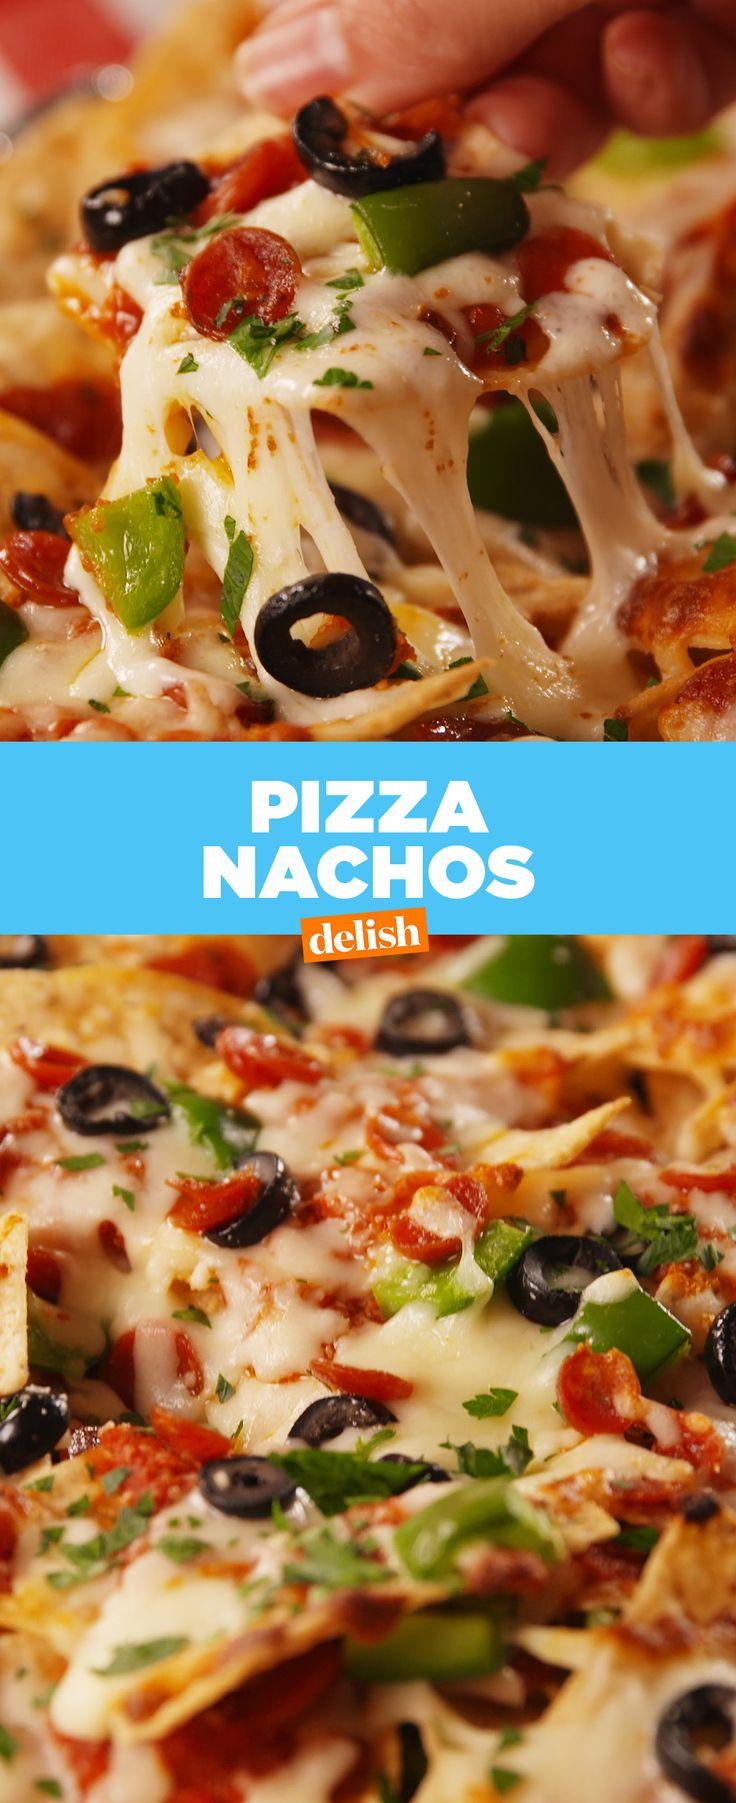 Pizza Nachos ... enough said. Get the recipe from Delish.com.